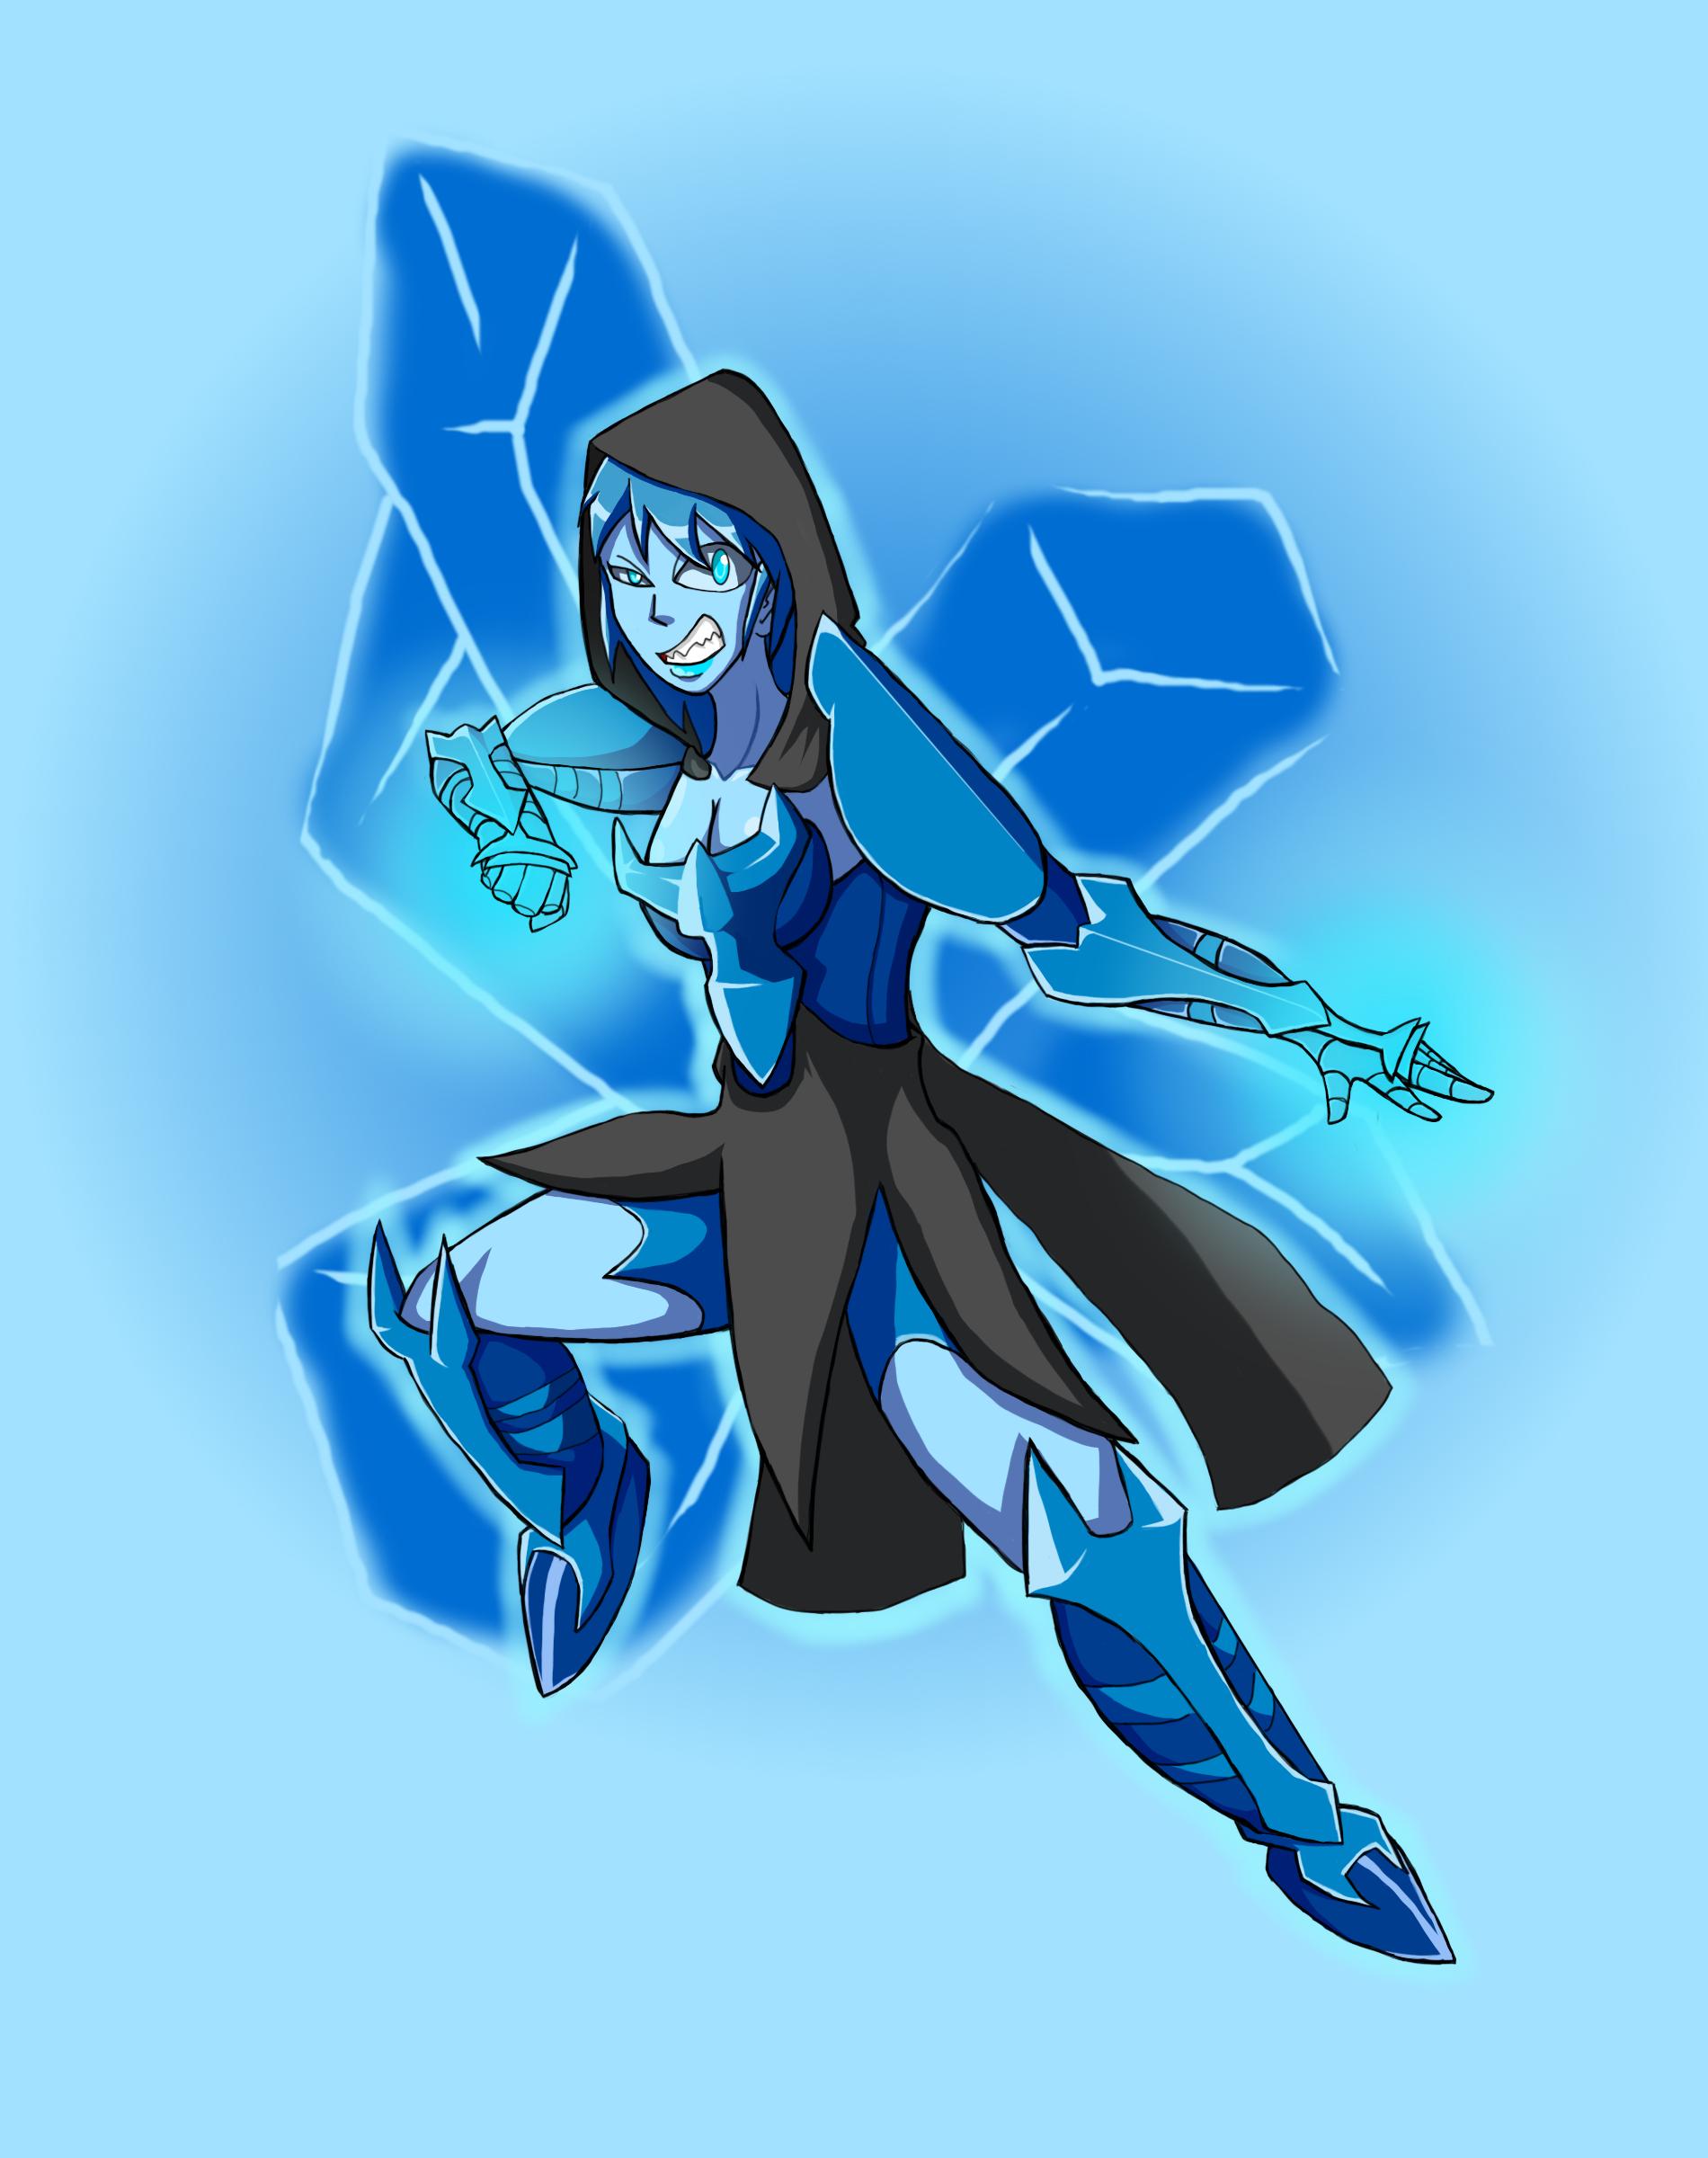 Icy demon warrior